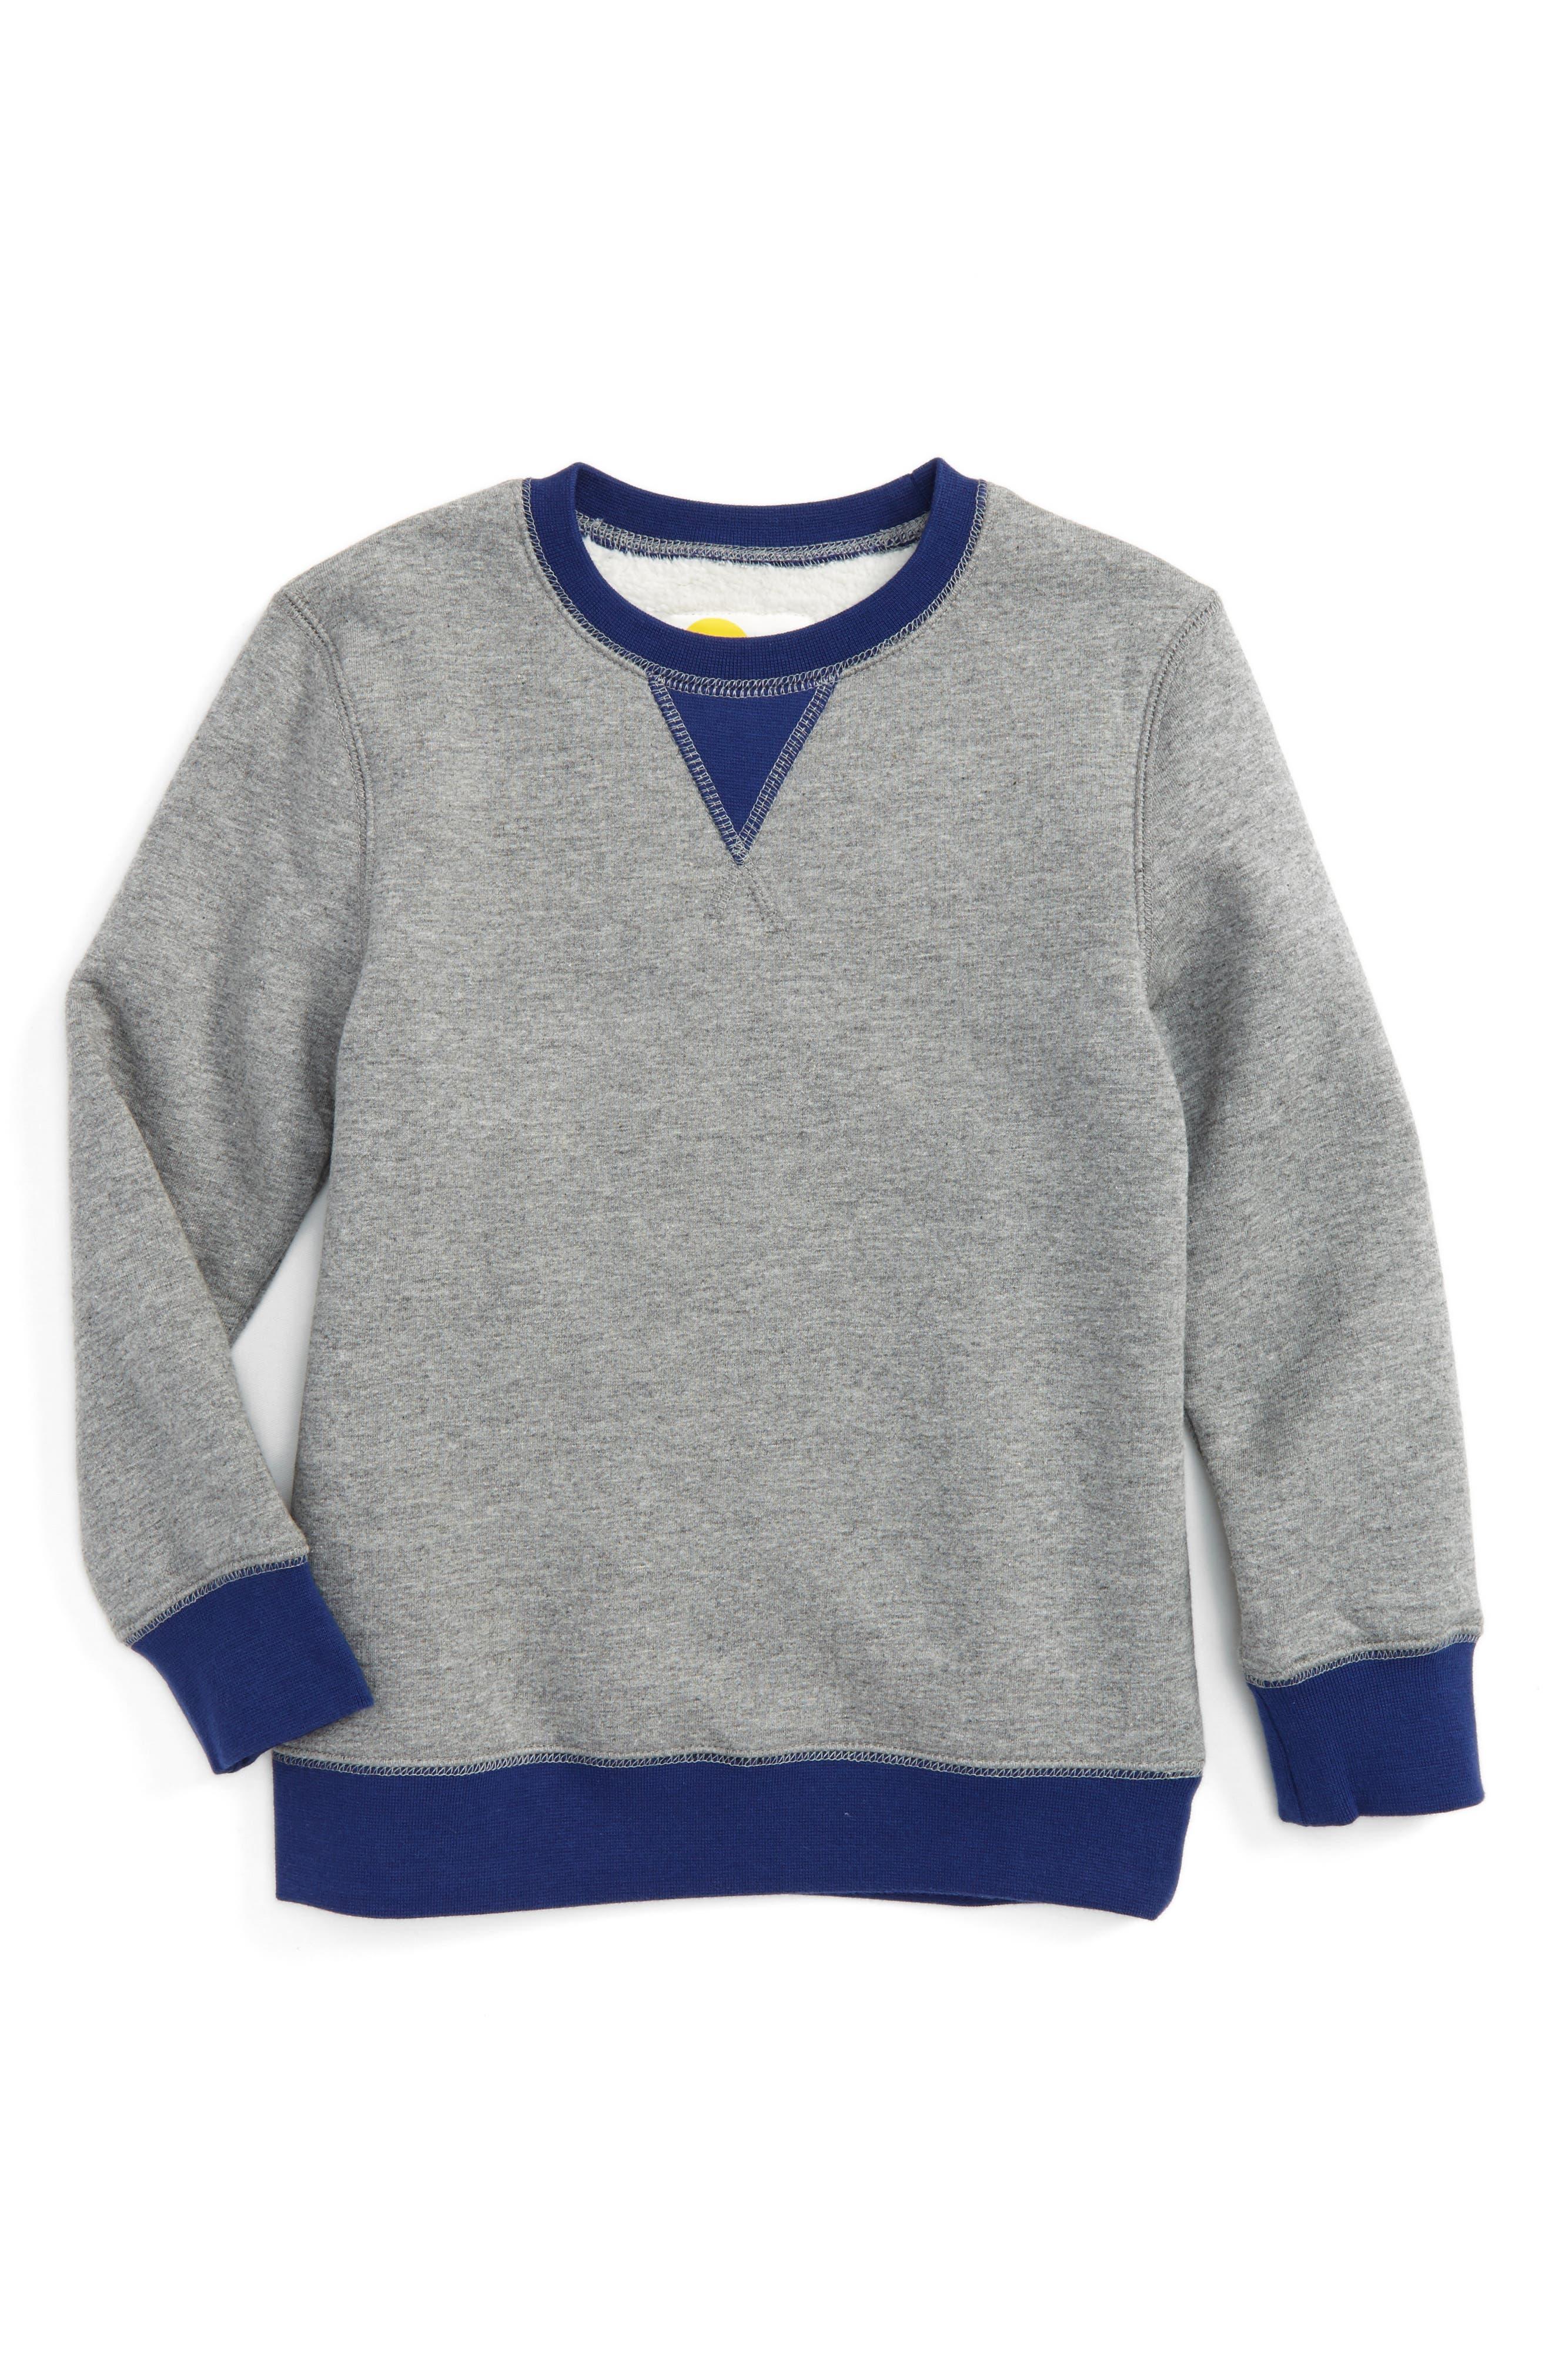 Shaggy Lined Sweatshirt,                         Main,                         color, 062